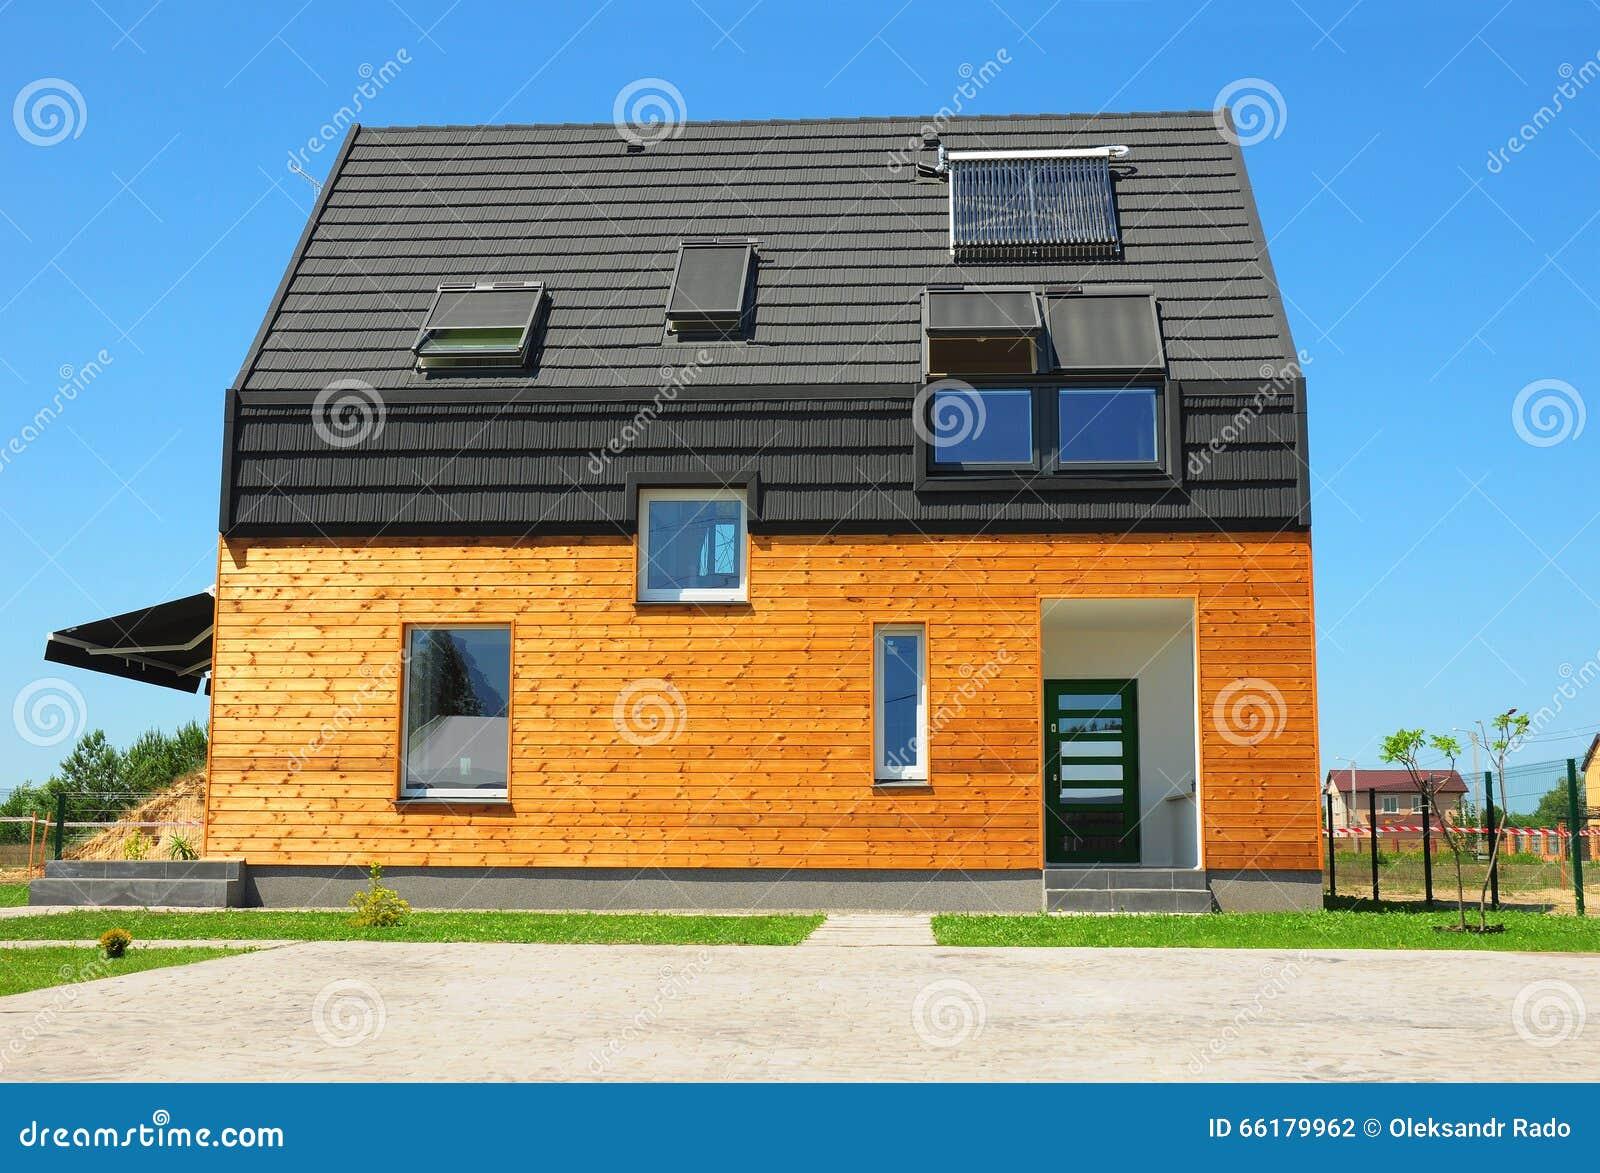 New Building House Energy Efficiency Solution Concept Outdoor. Solar Energy, Solar Water Heater, Solar Panels, Skylights, Ventilat